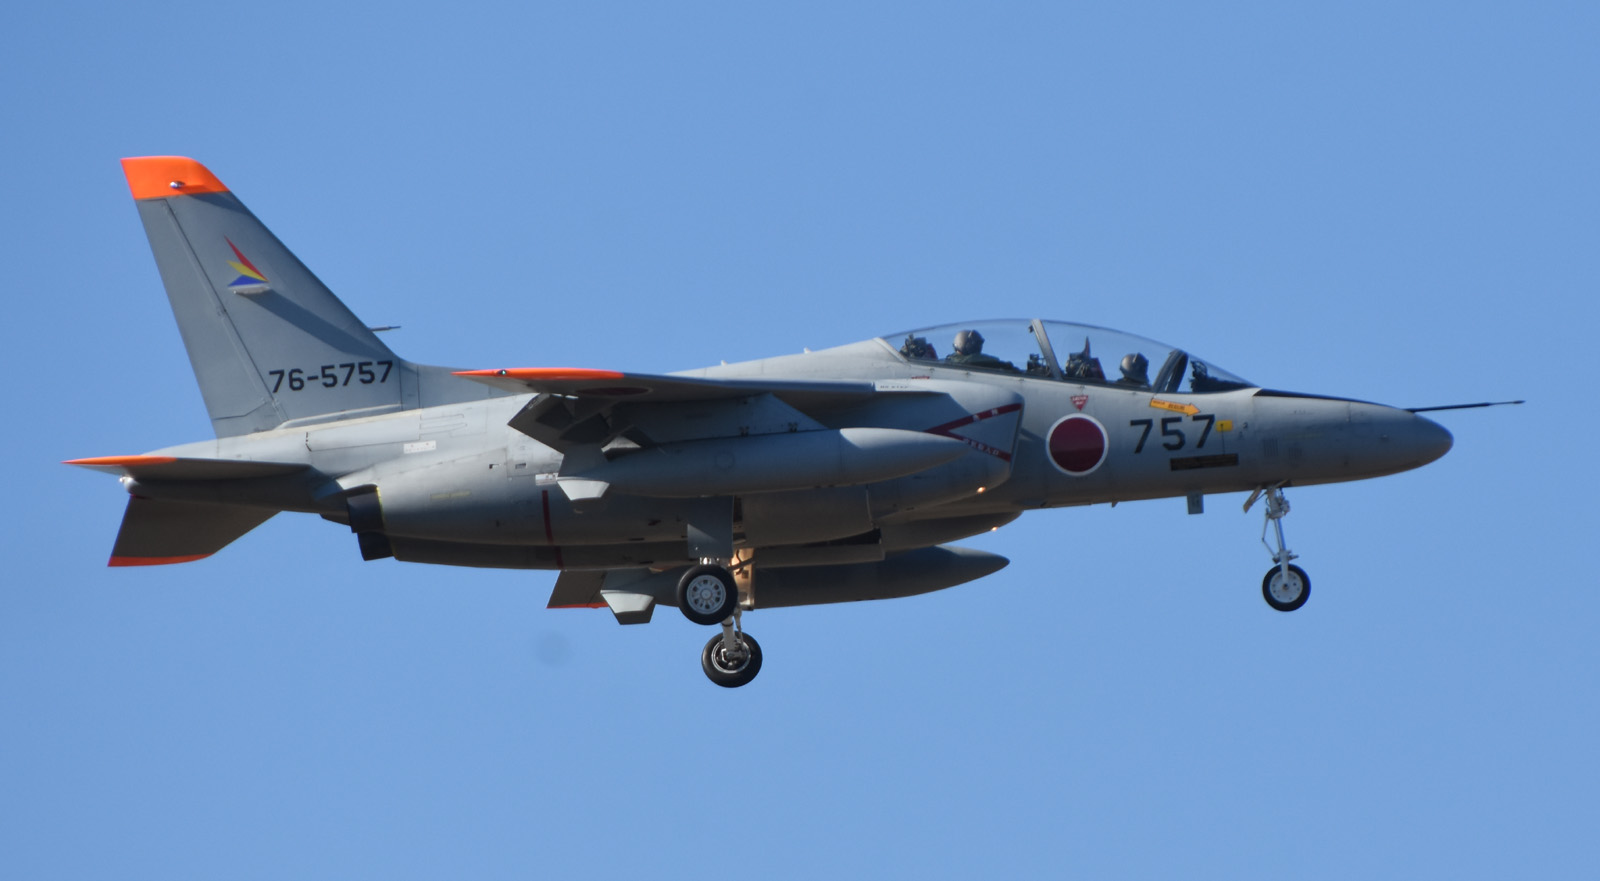 T4161216g004